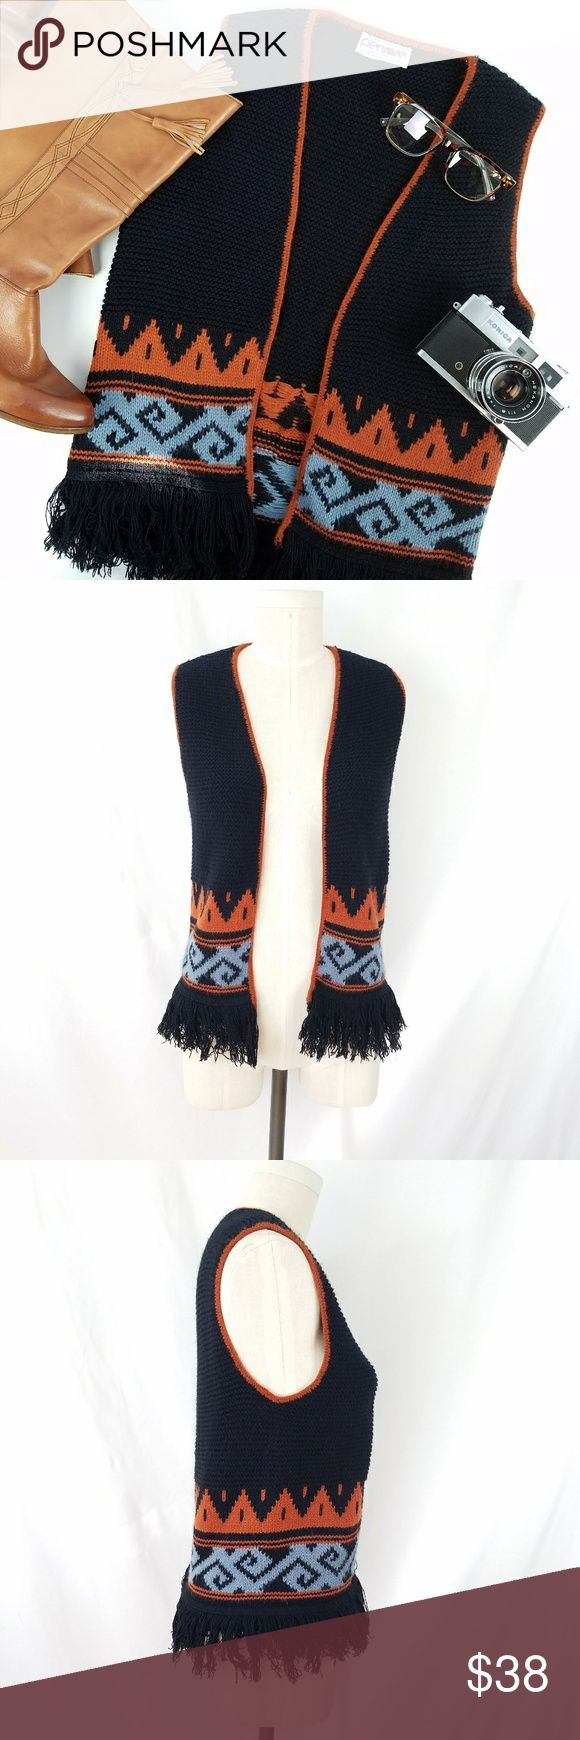 Vintage Penrose Southwestern Knit Vest 100% acrylic  Open front (no closure) Fringe hemline Excellent vintage condition!  PLEASE READ CLOSET INFO AND POLICIES POST Vintage Jackets & Coats Vests